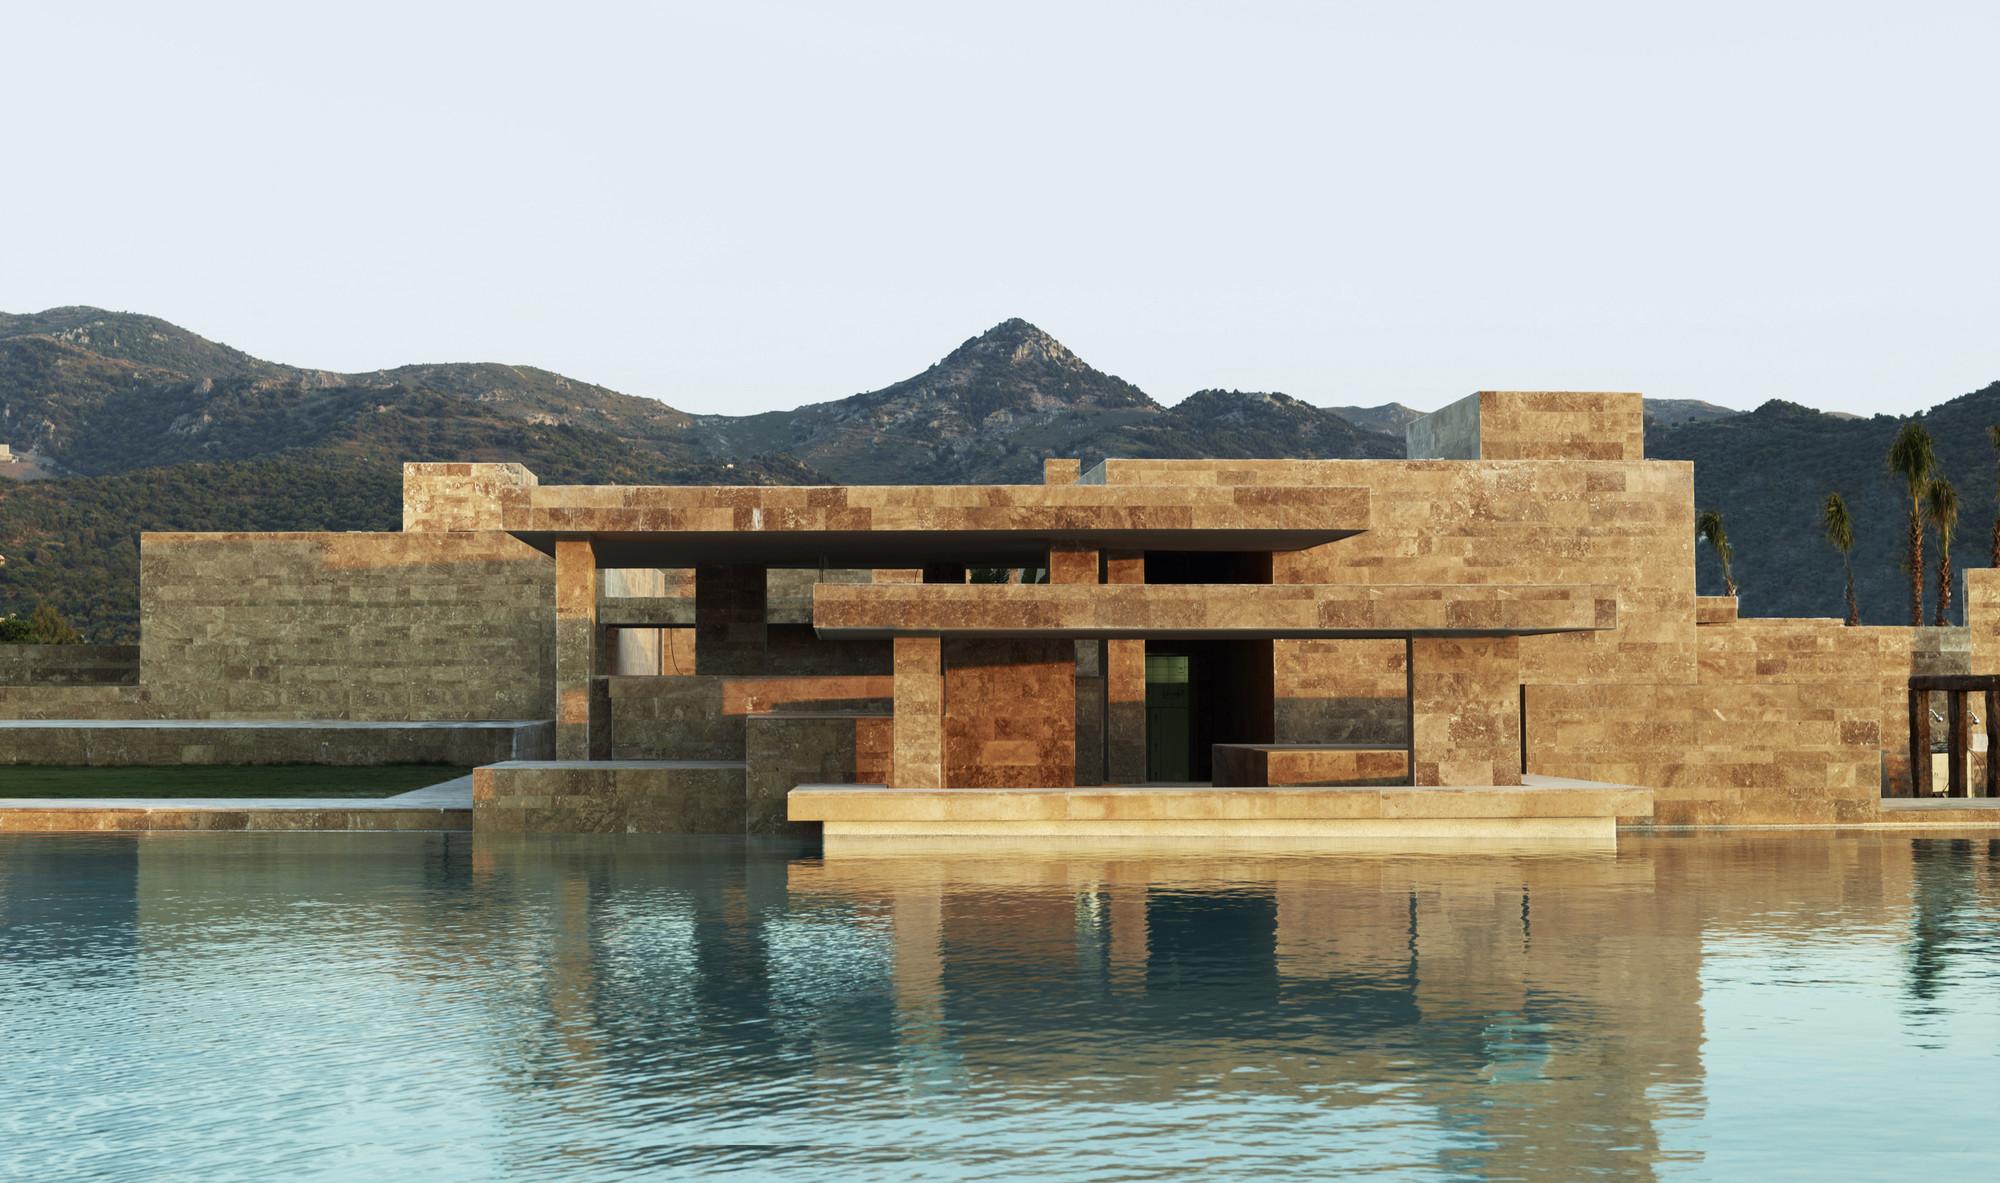 Yalikavak Marina Complex / EAA-Emre Arolat Architects. Imagen cortesía de WAF